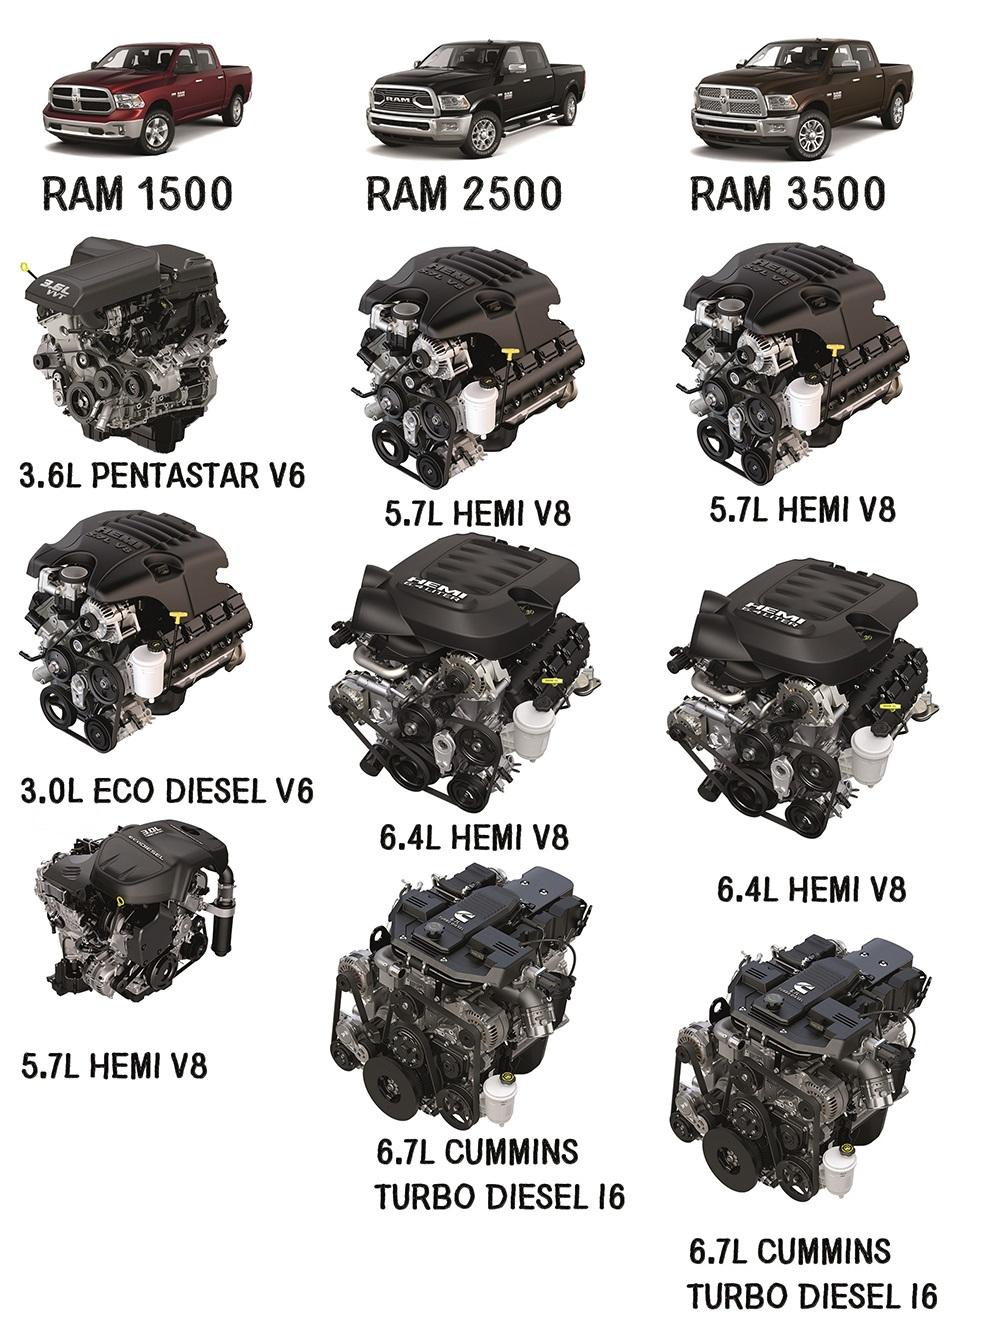 Aventura Ram Trucks Diesel Engines